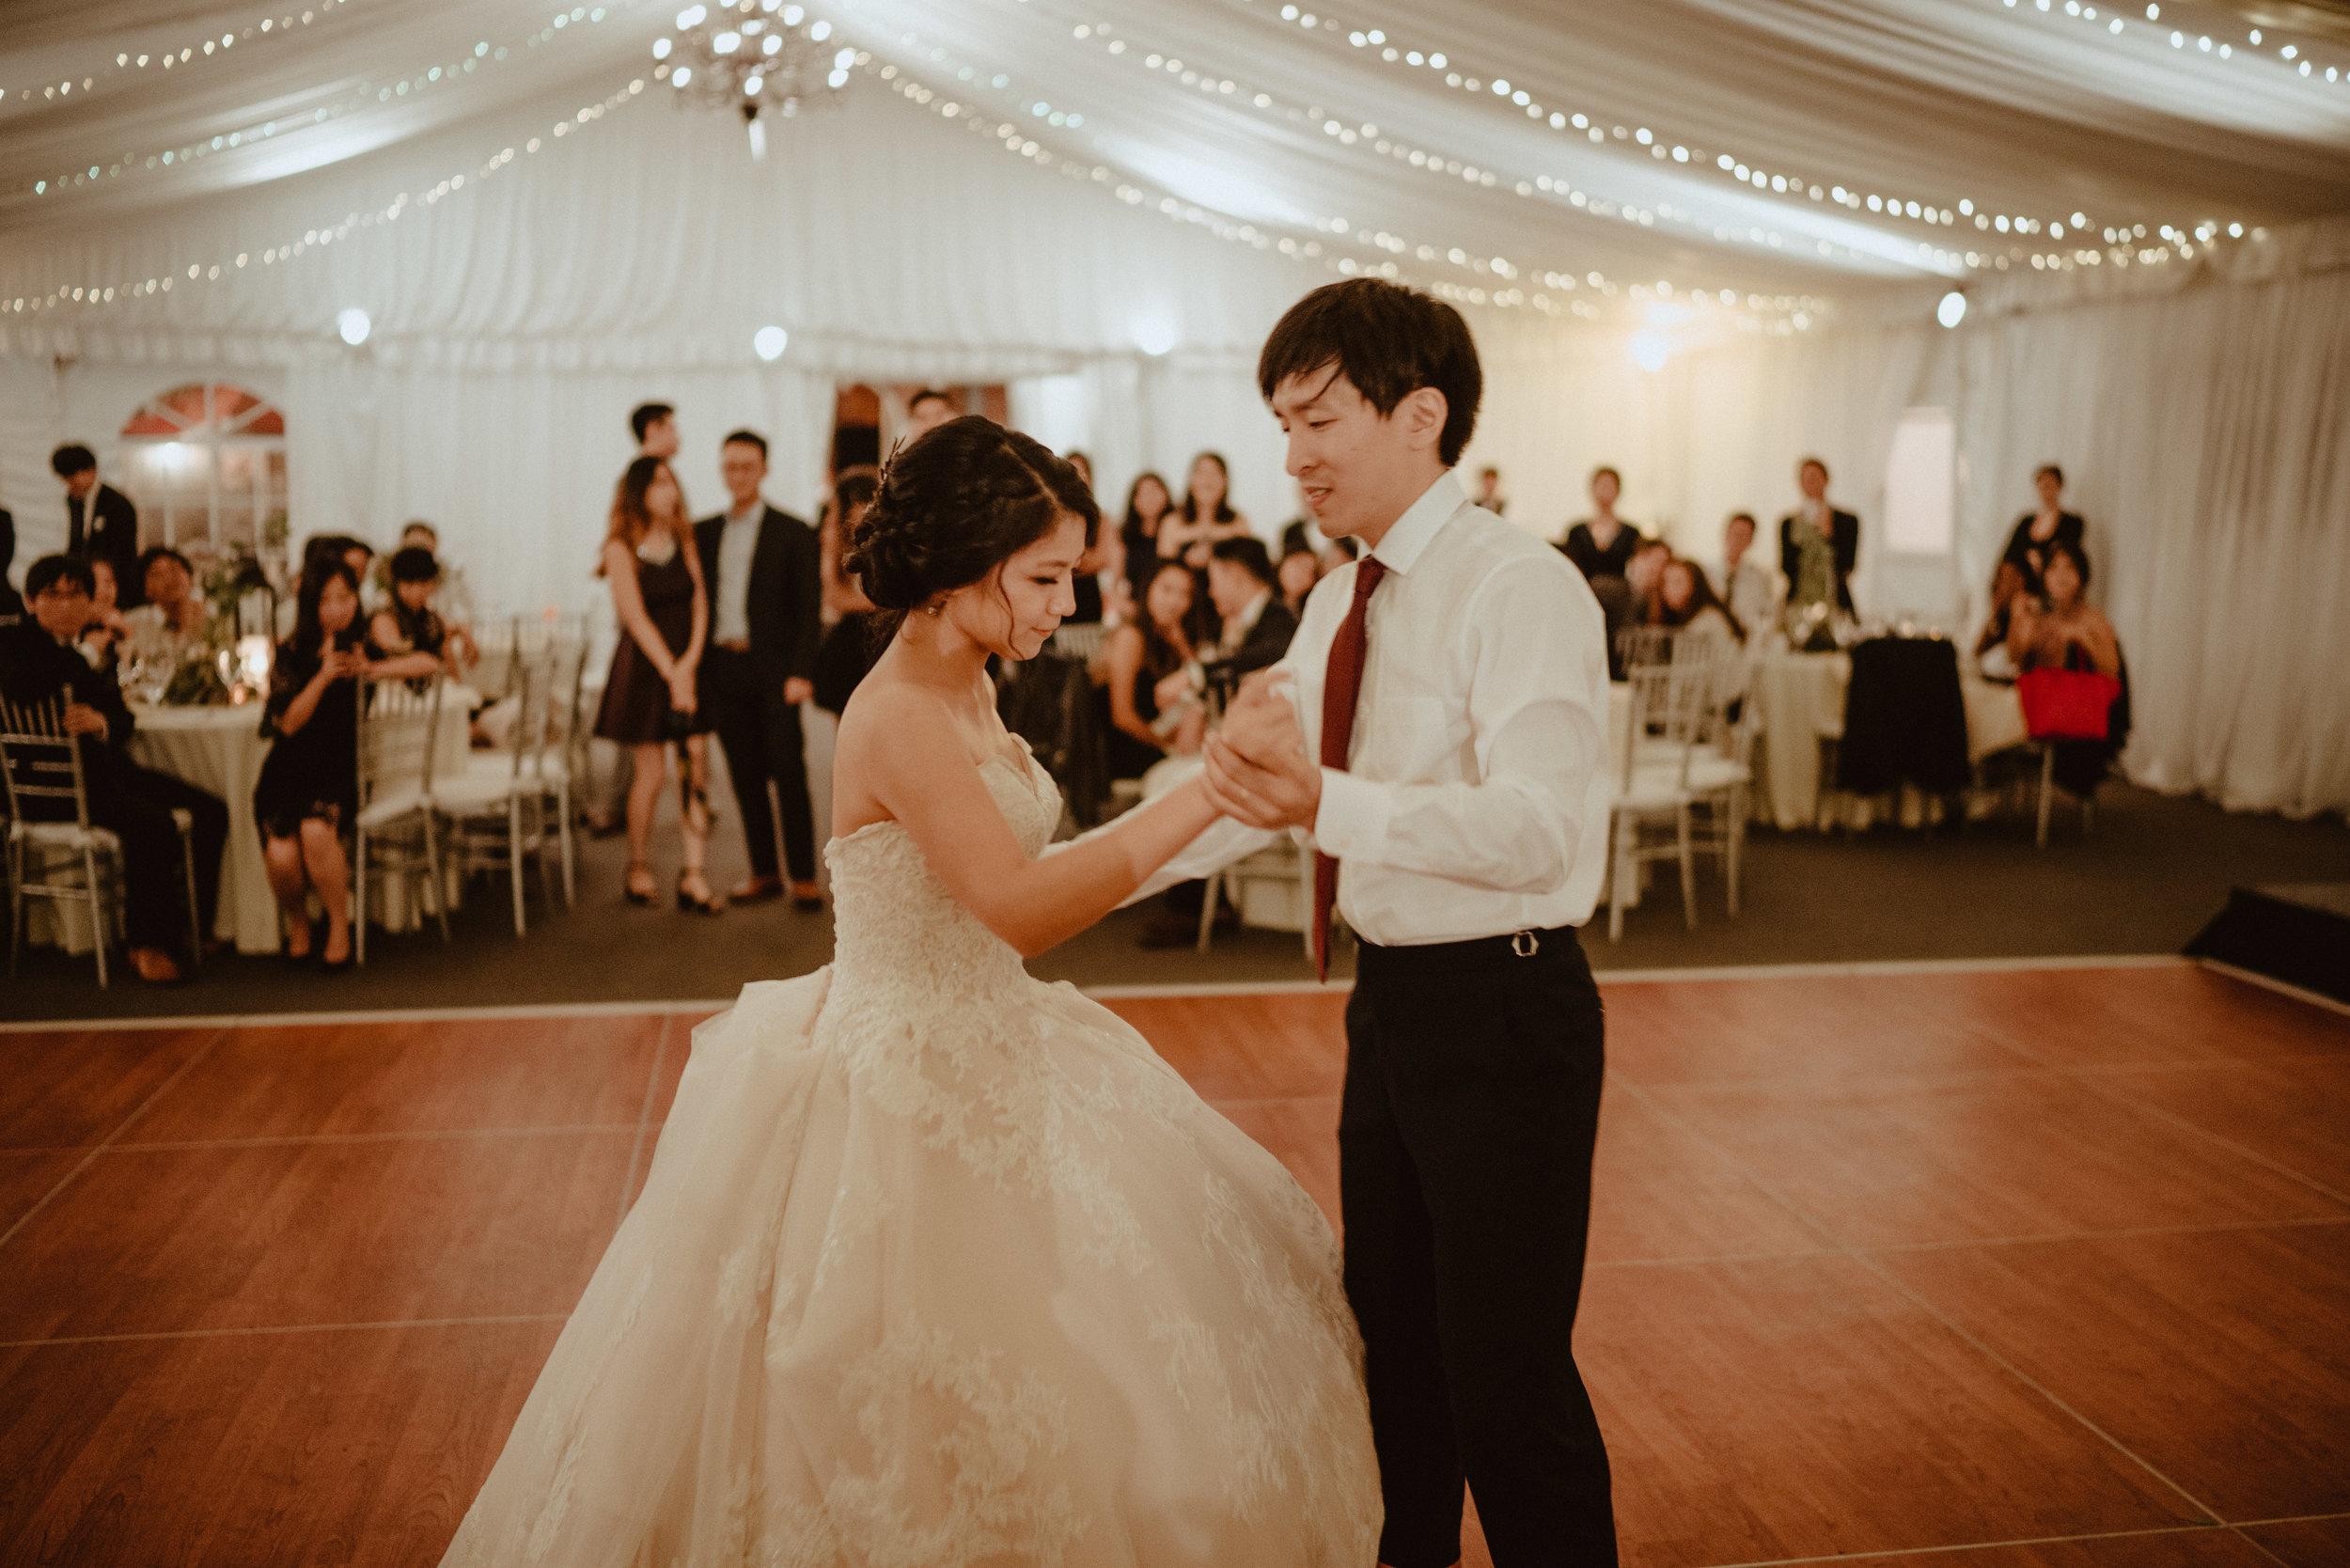 Irene-and-Jae-2019_Brooklyn_Wedding_Photographer_Chellise_Michael_Photography--155.jpg